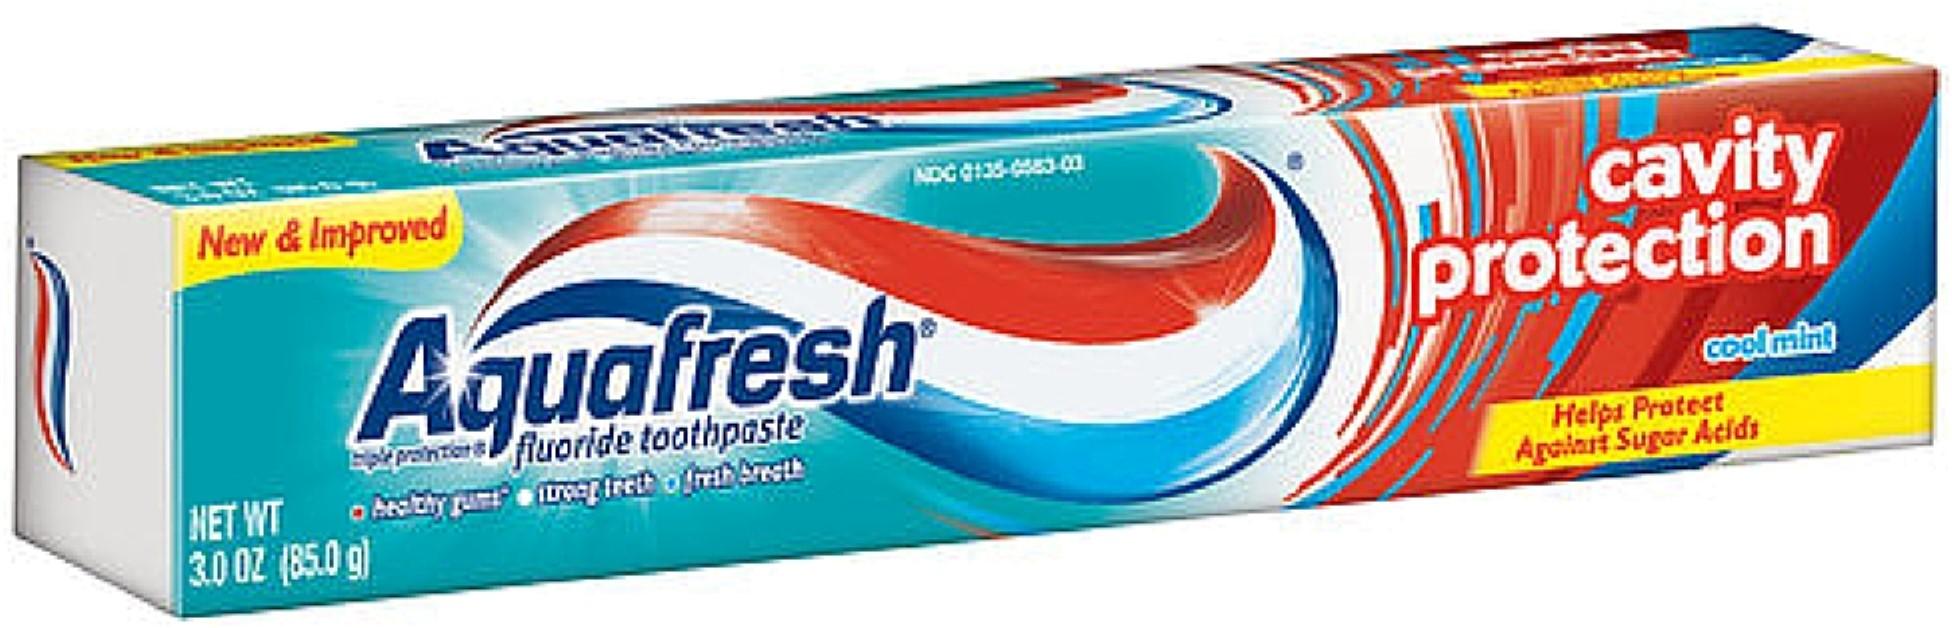 Aquafresh Cavity Protection